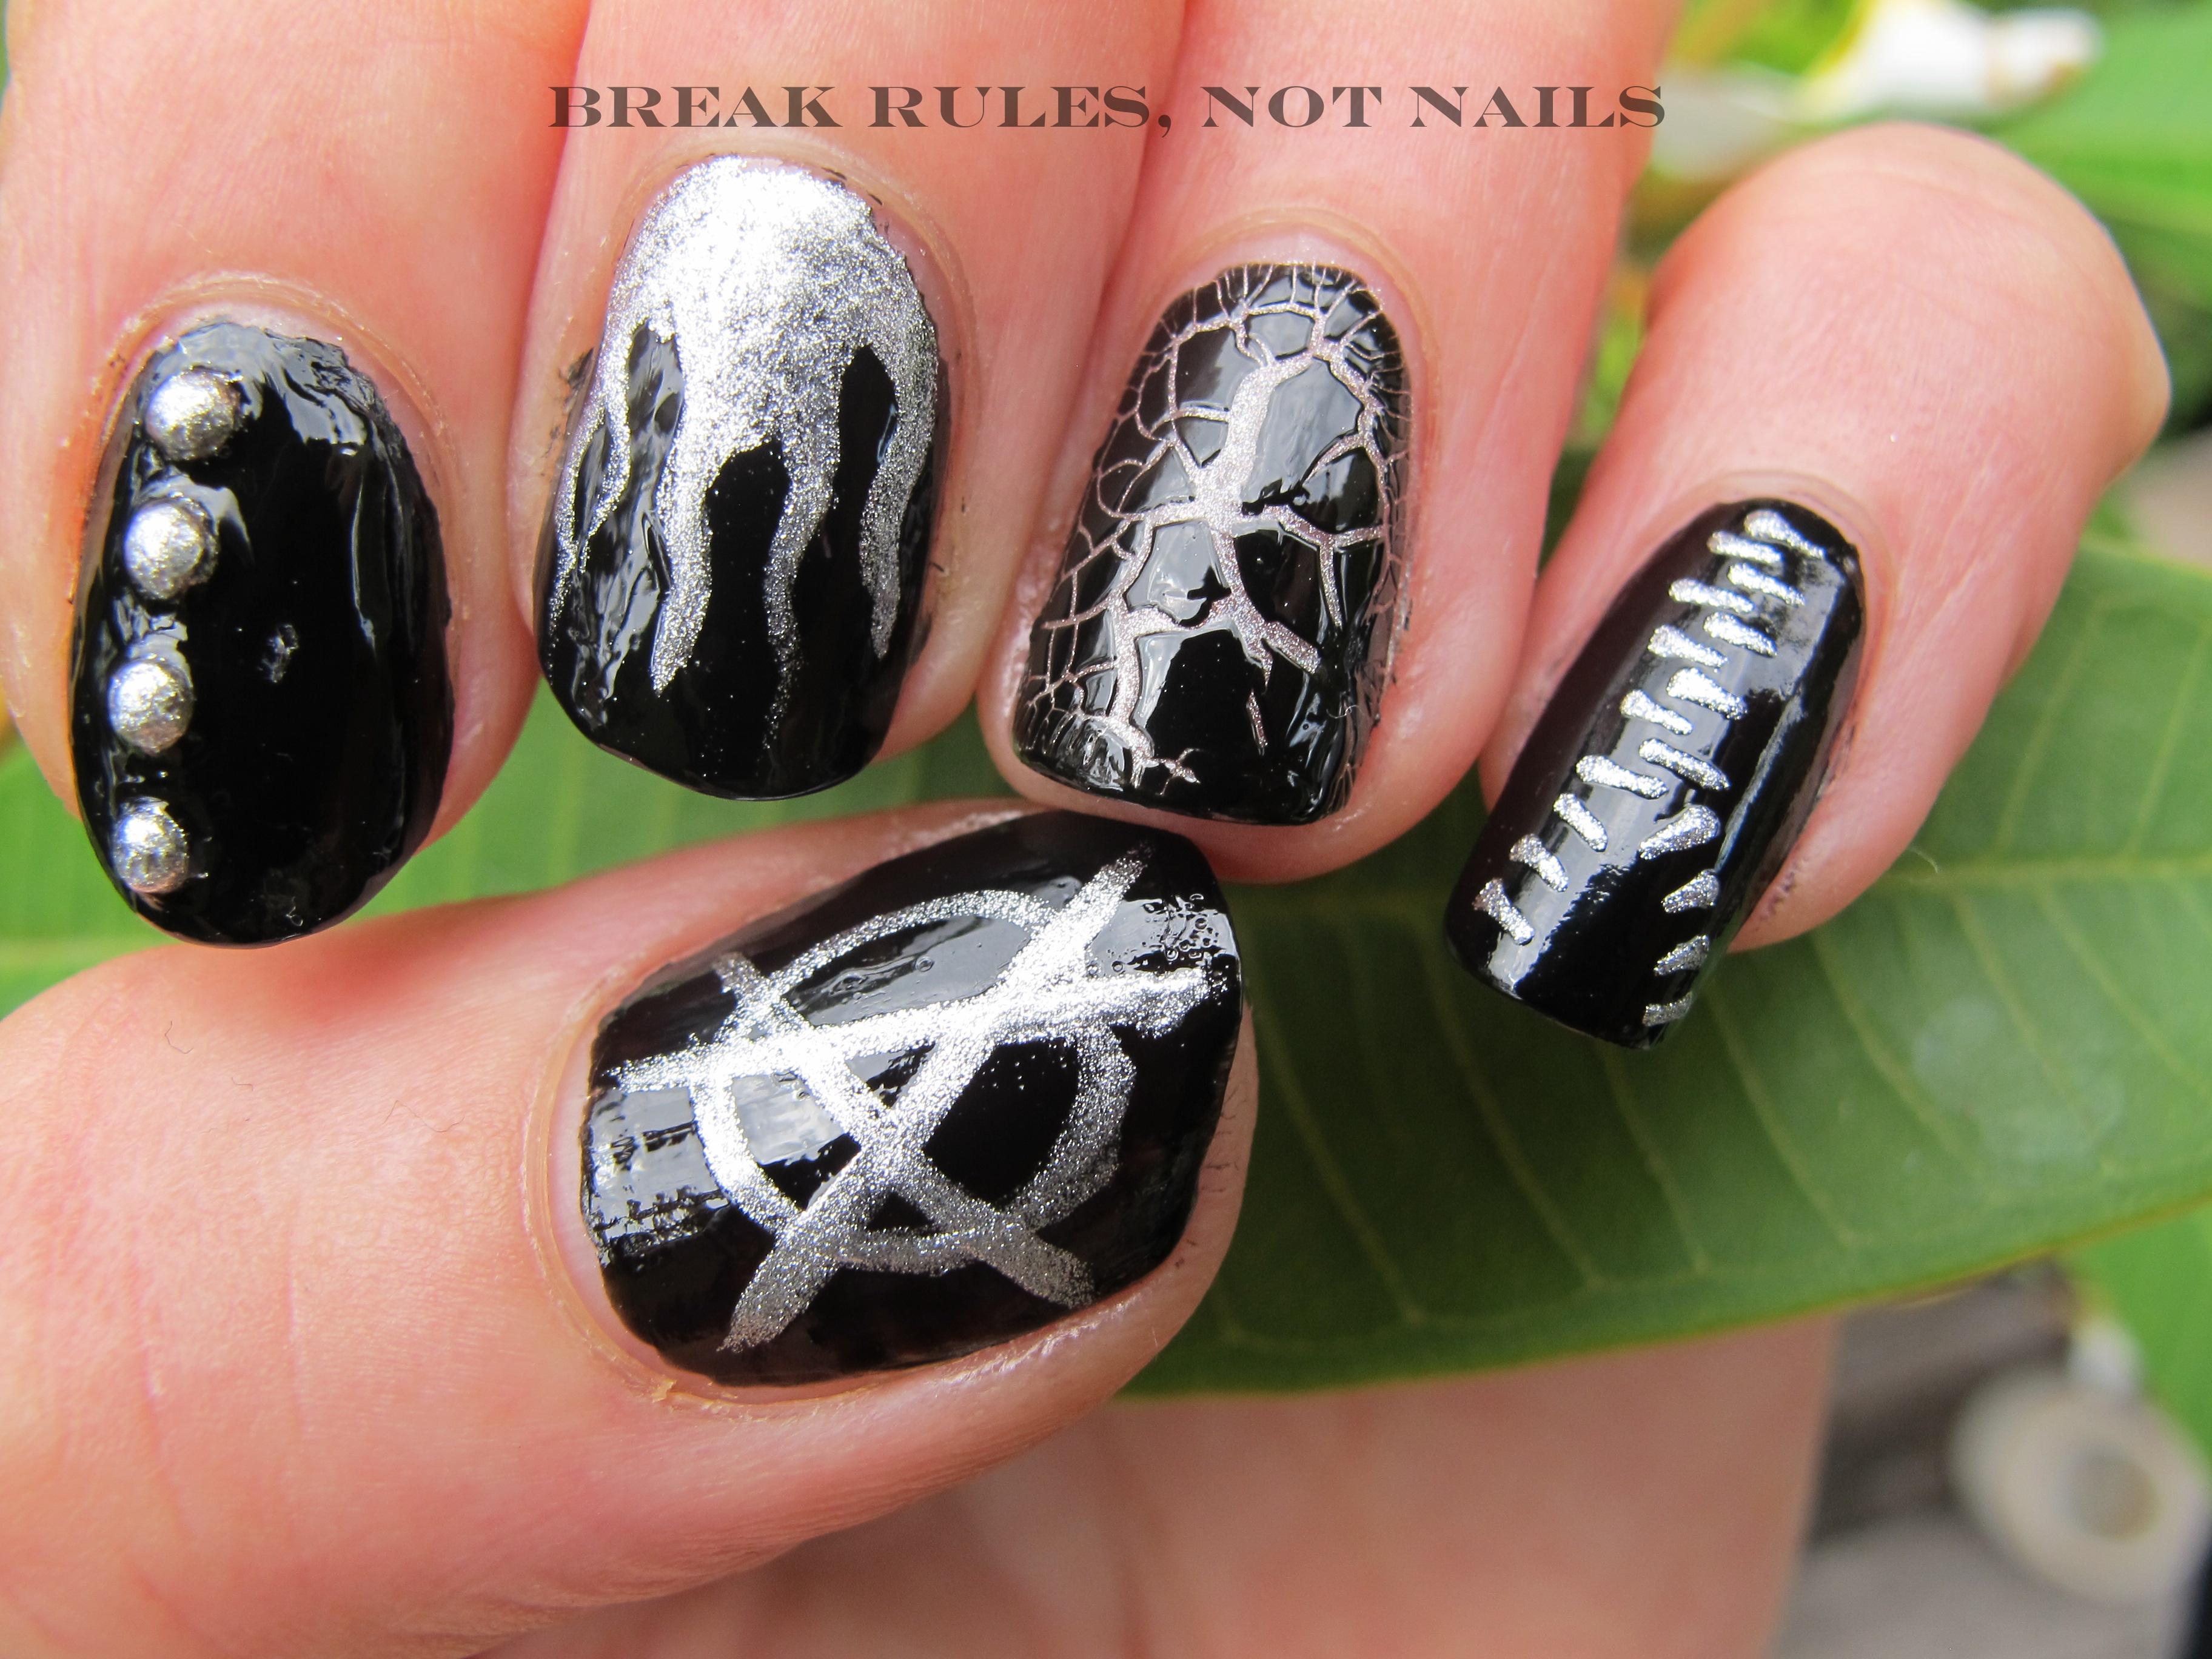 nail art | Break rules, not nails